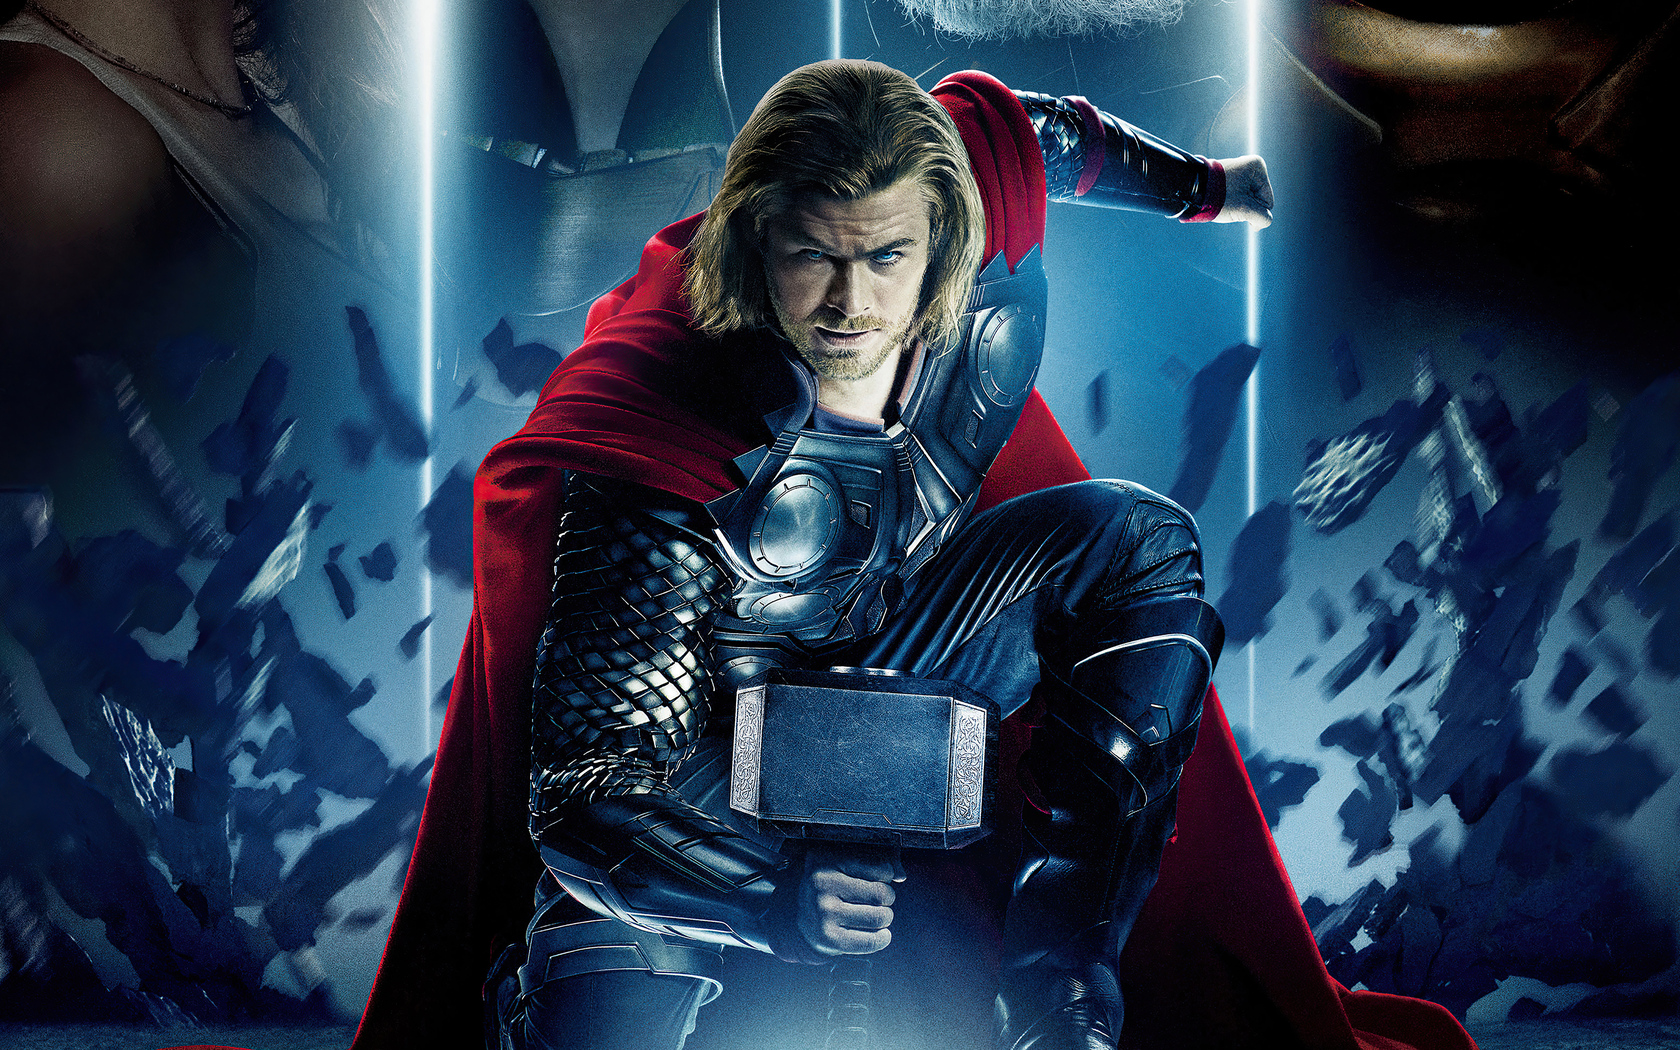 thor-in-avengers-age-of-ultron-4k-7g.jpg